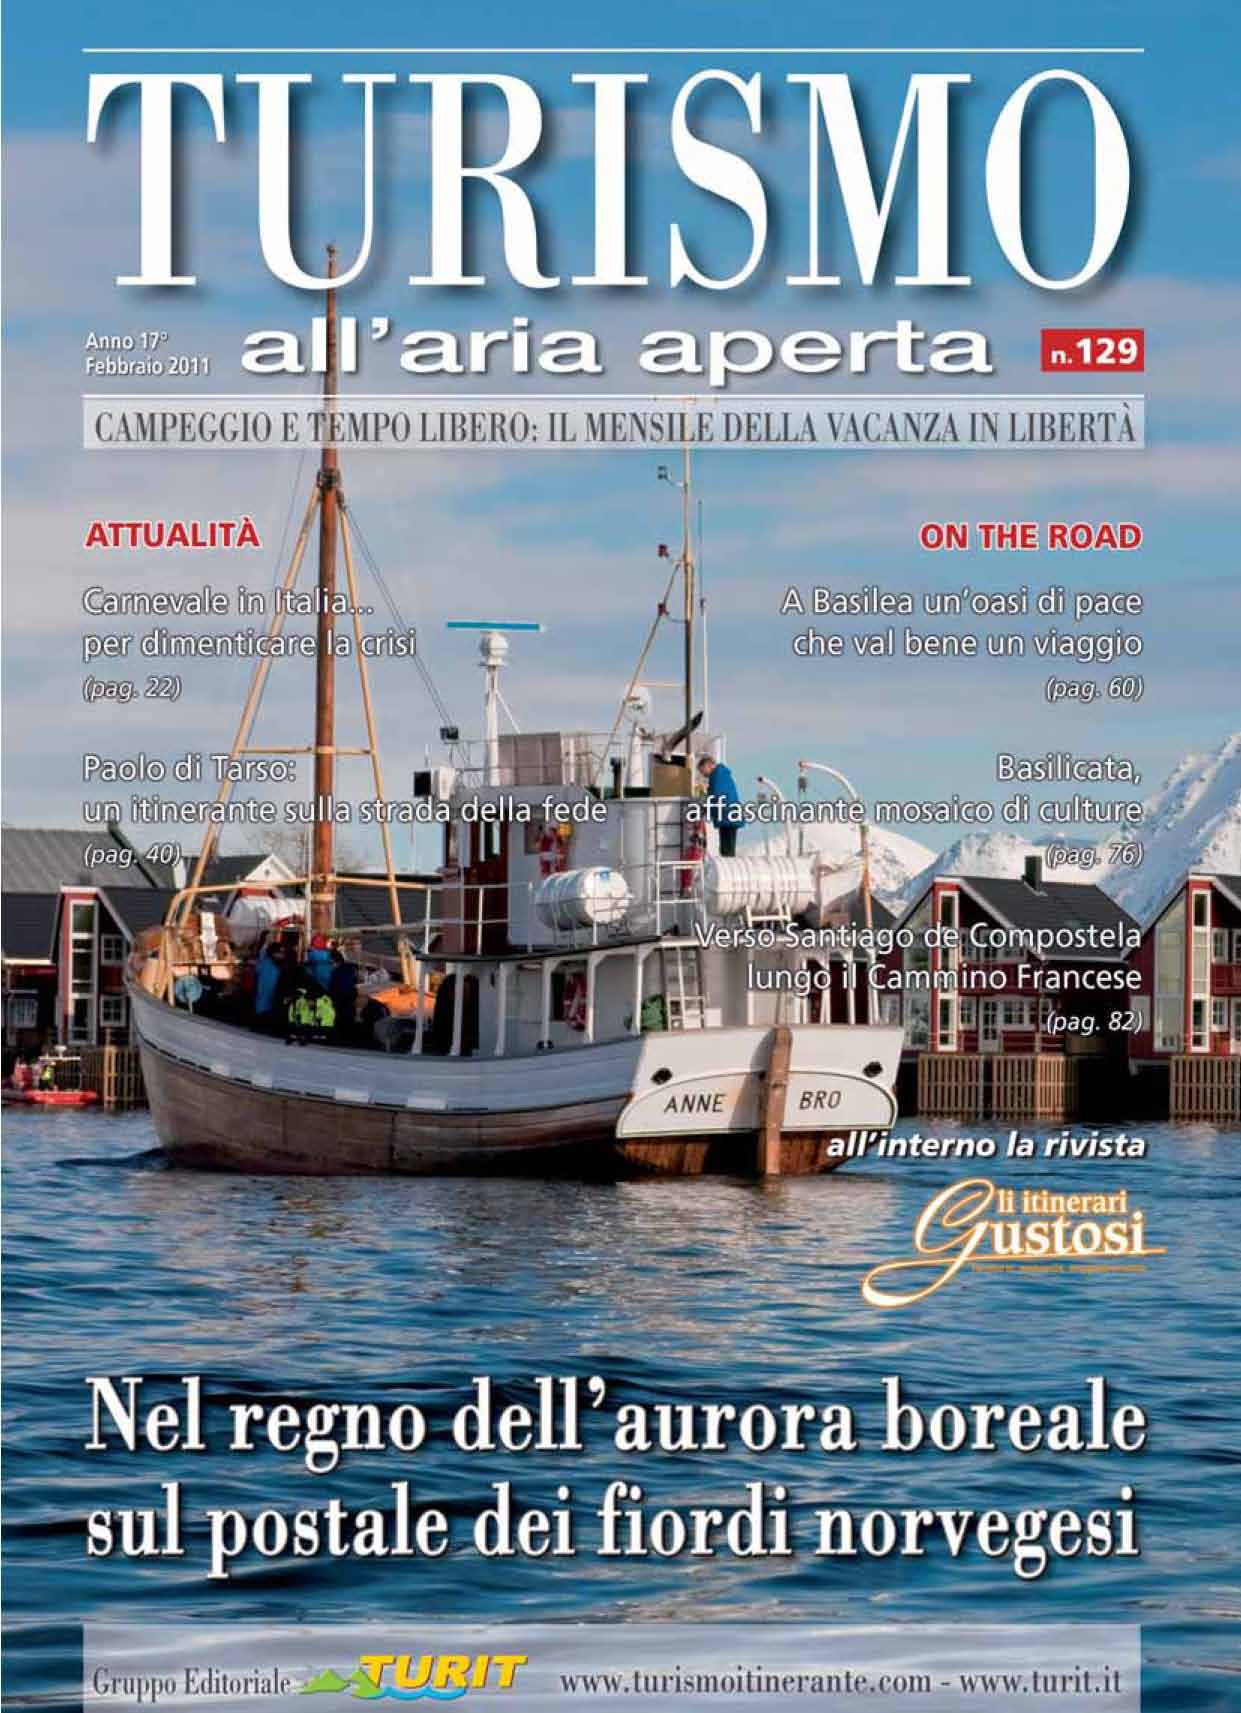 Turismo all'aria aperta Nr.129 Febbraio 2011